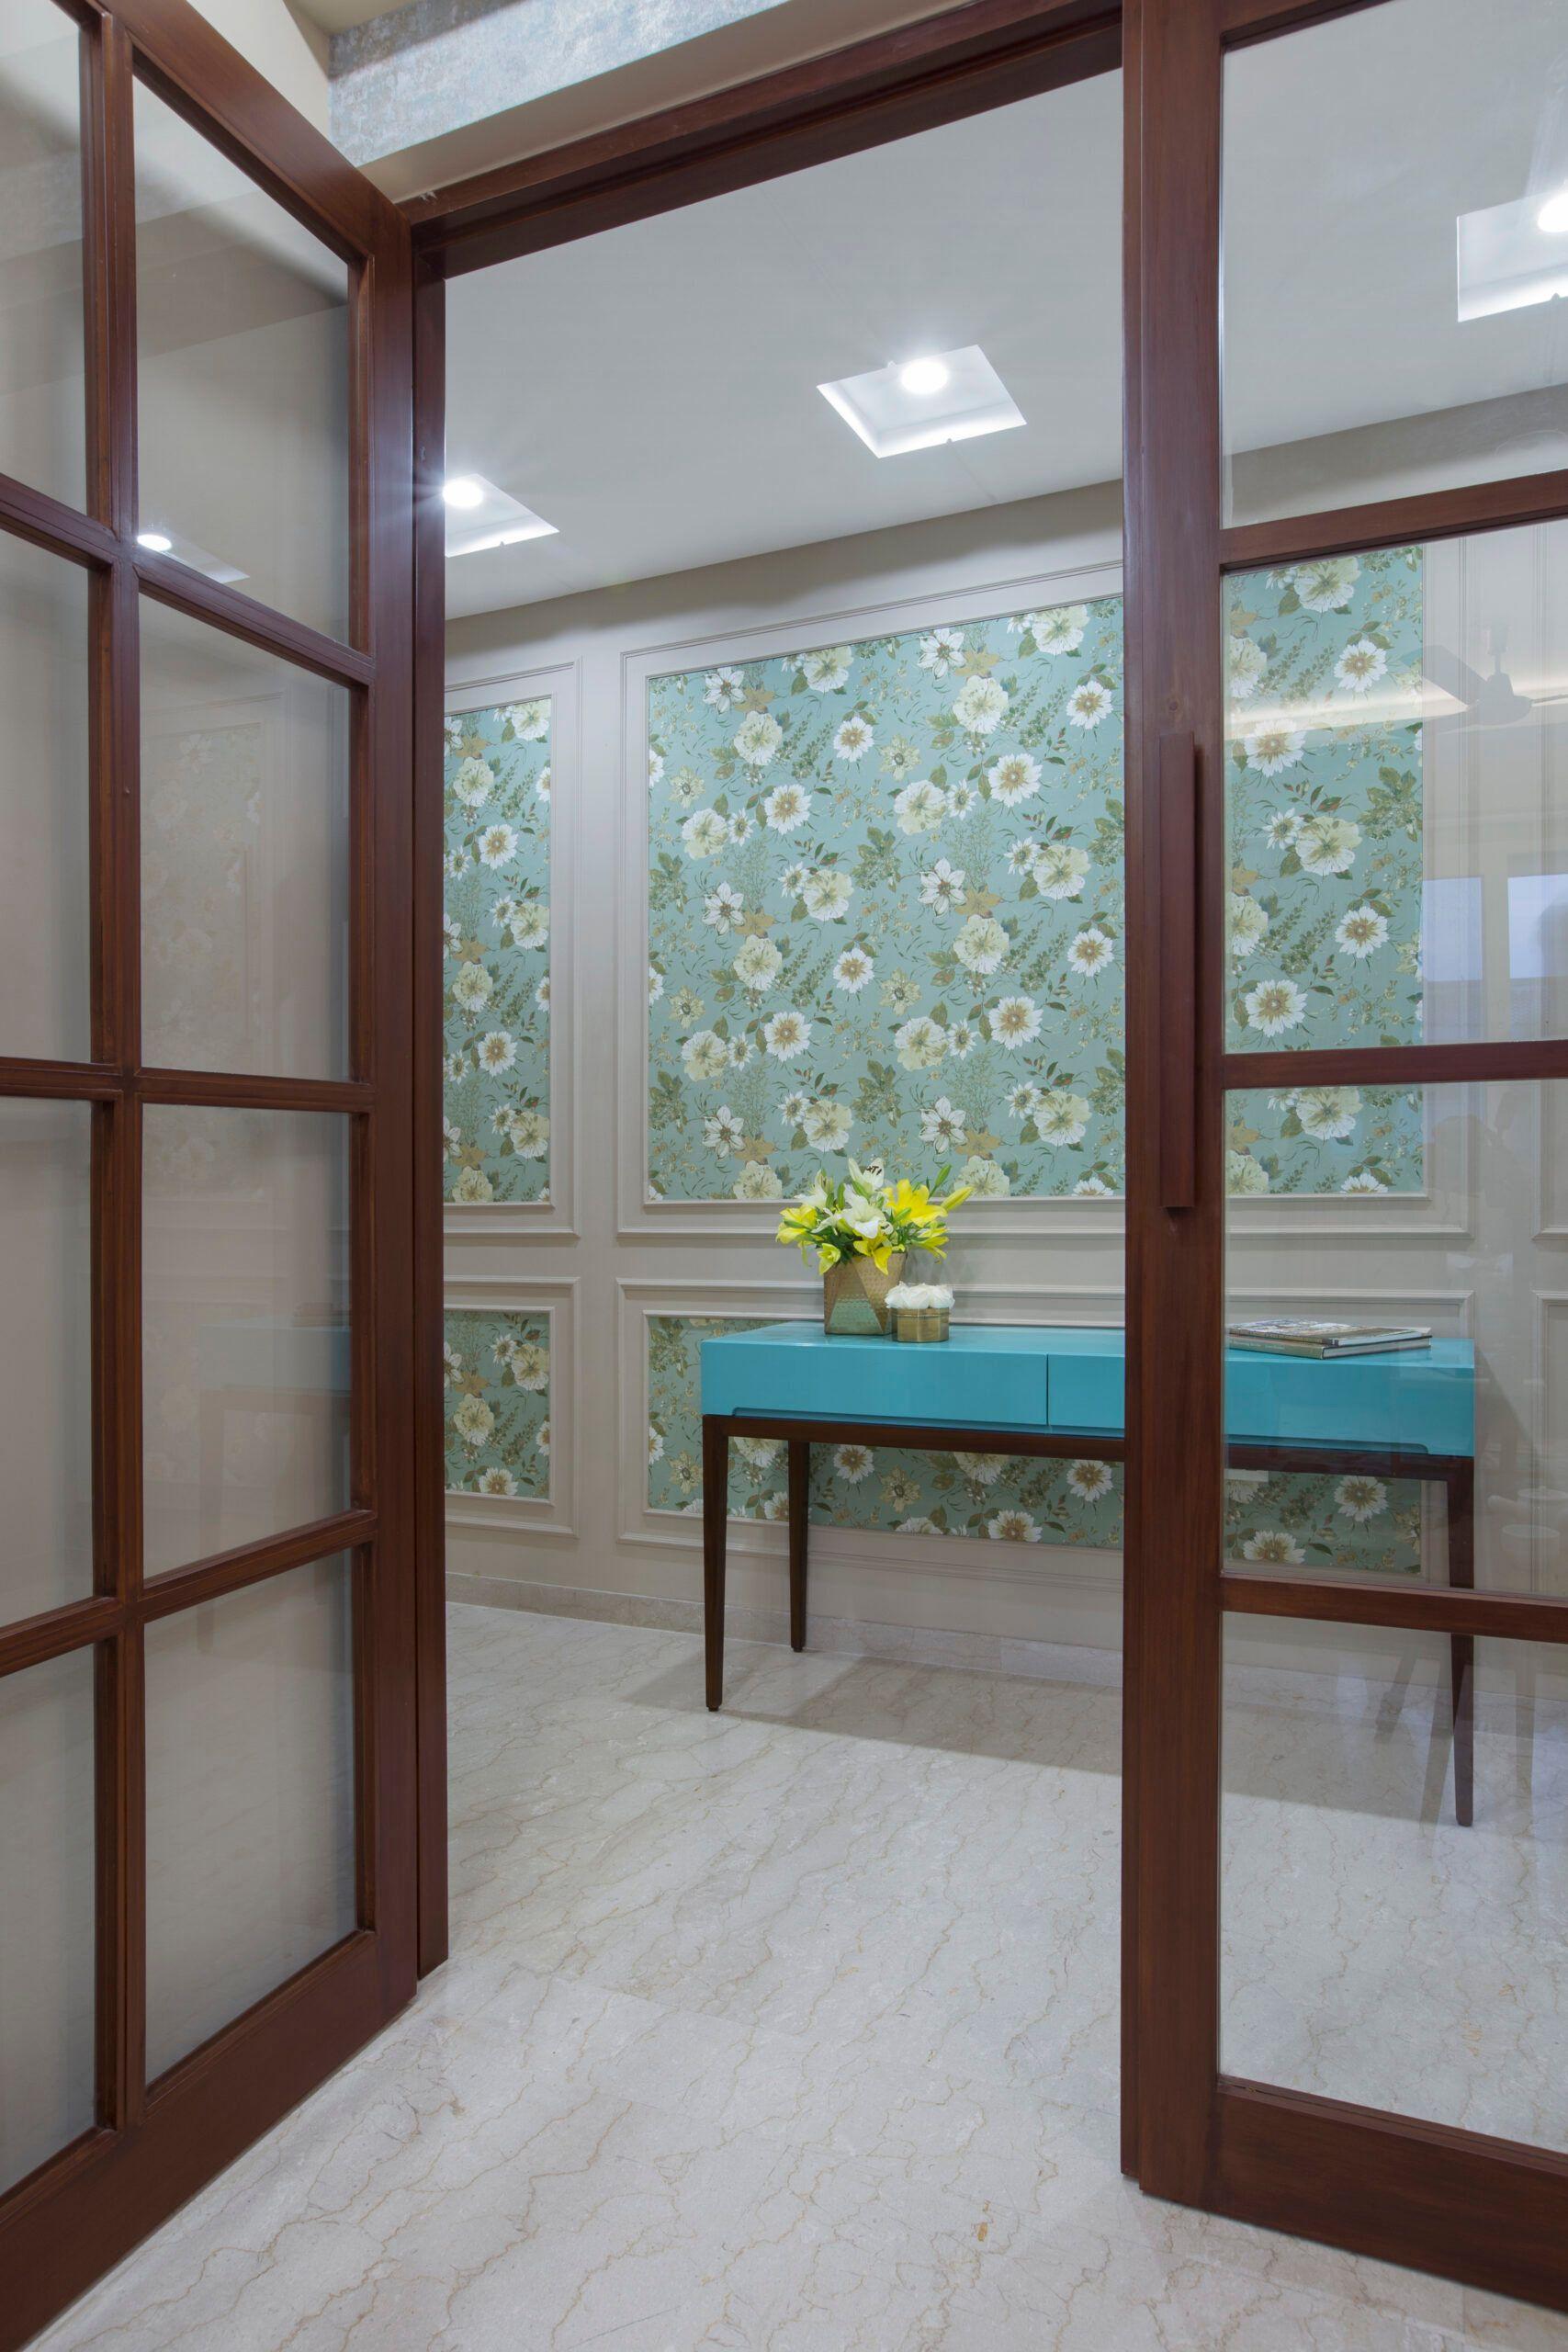 console tables-blue table-blue floral wallpaper